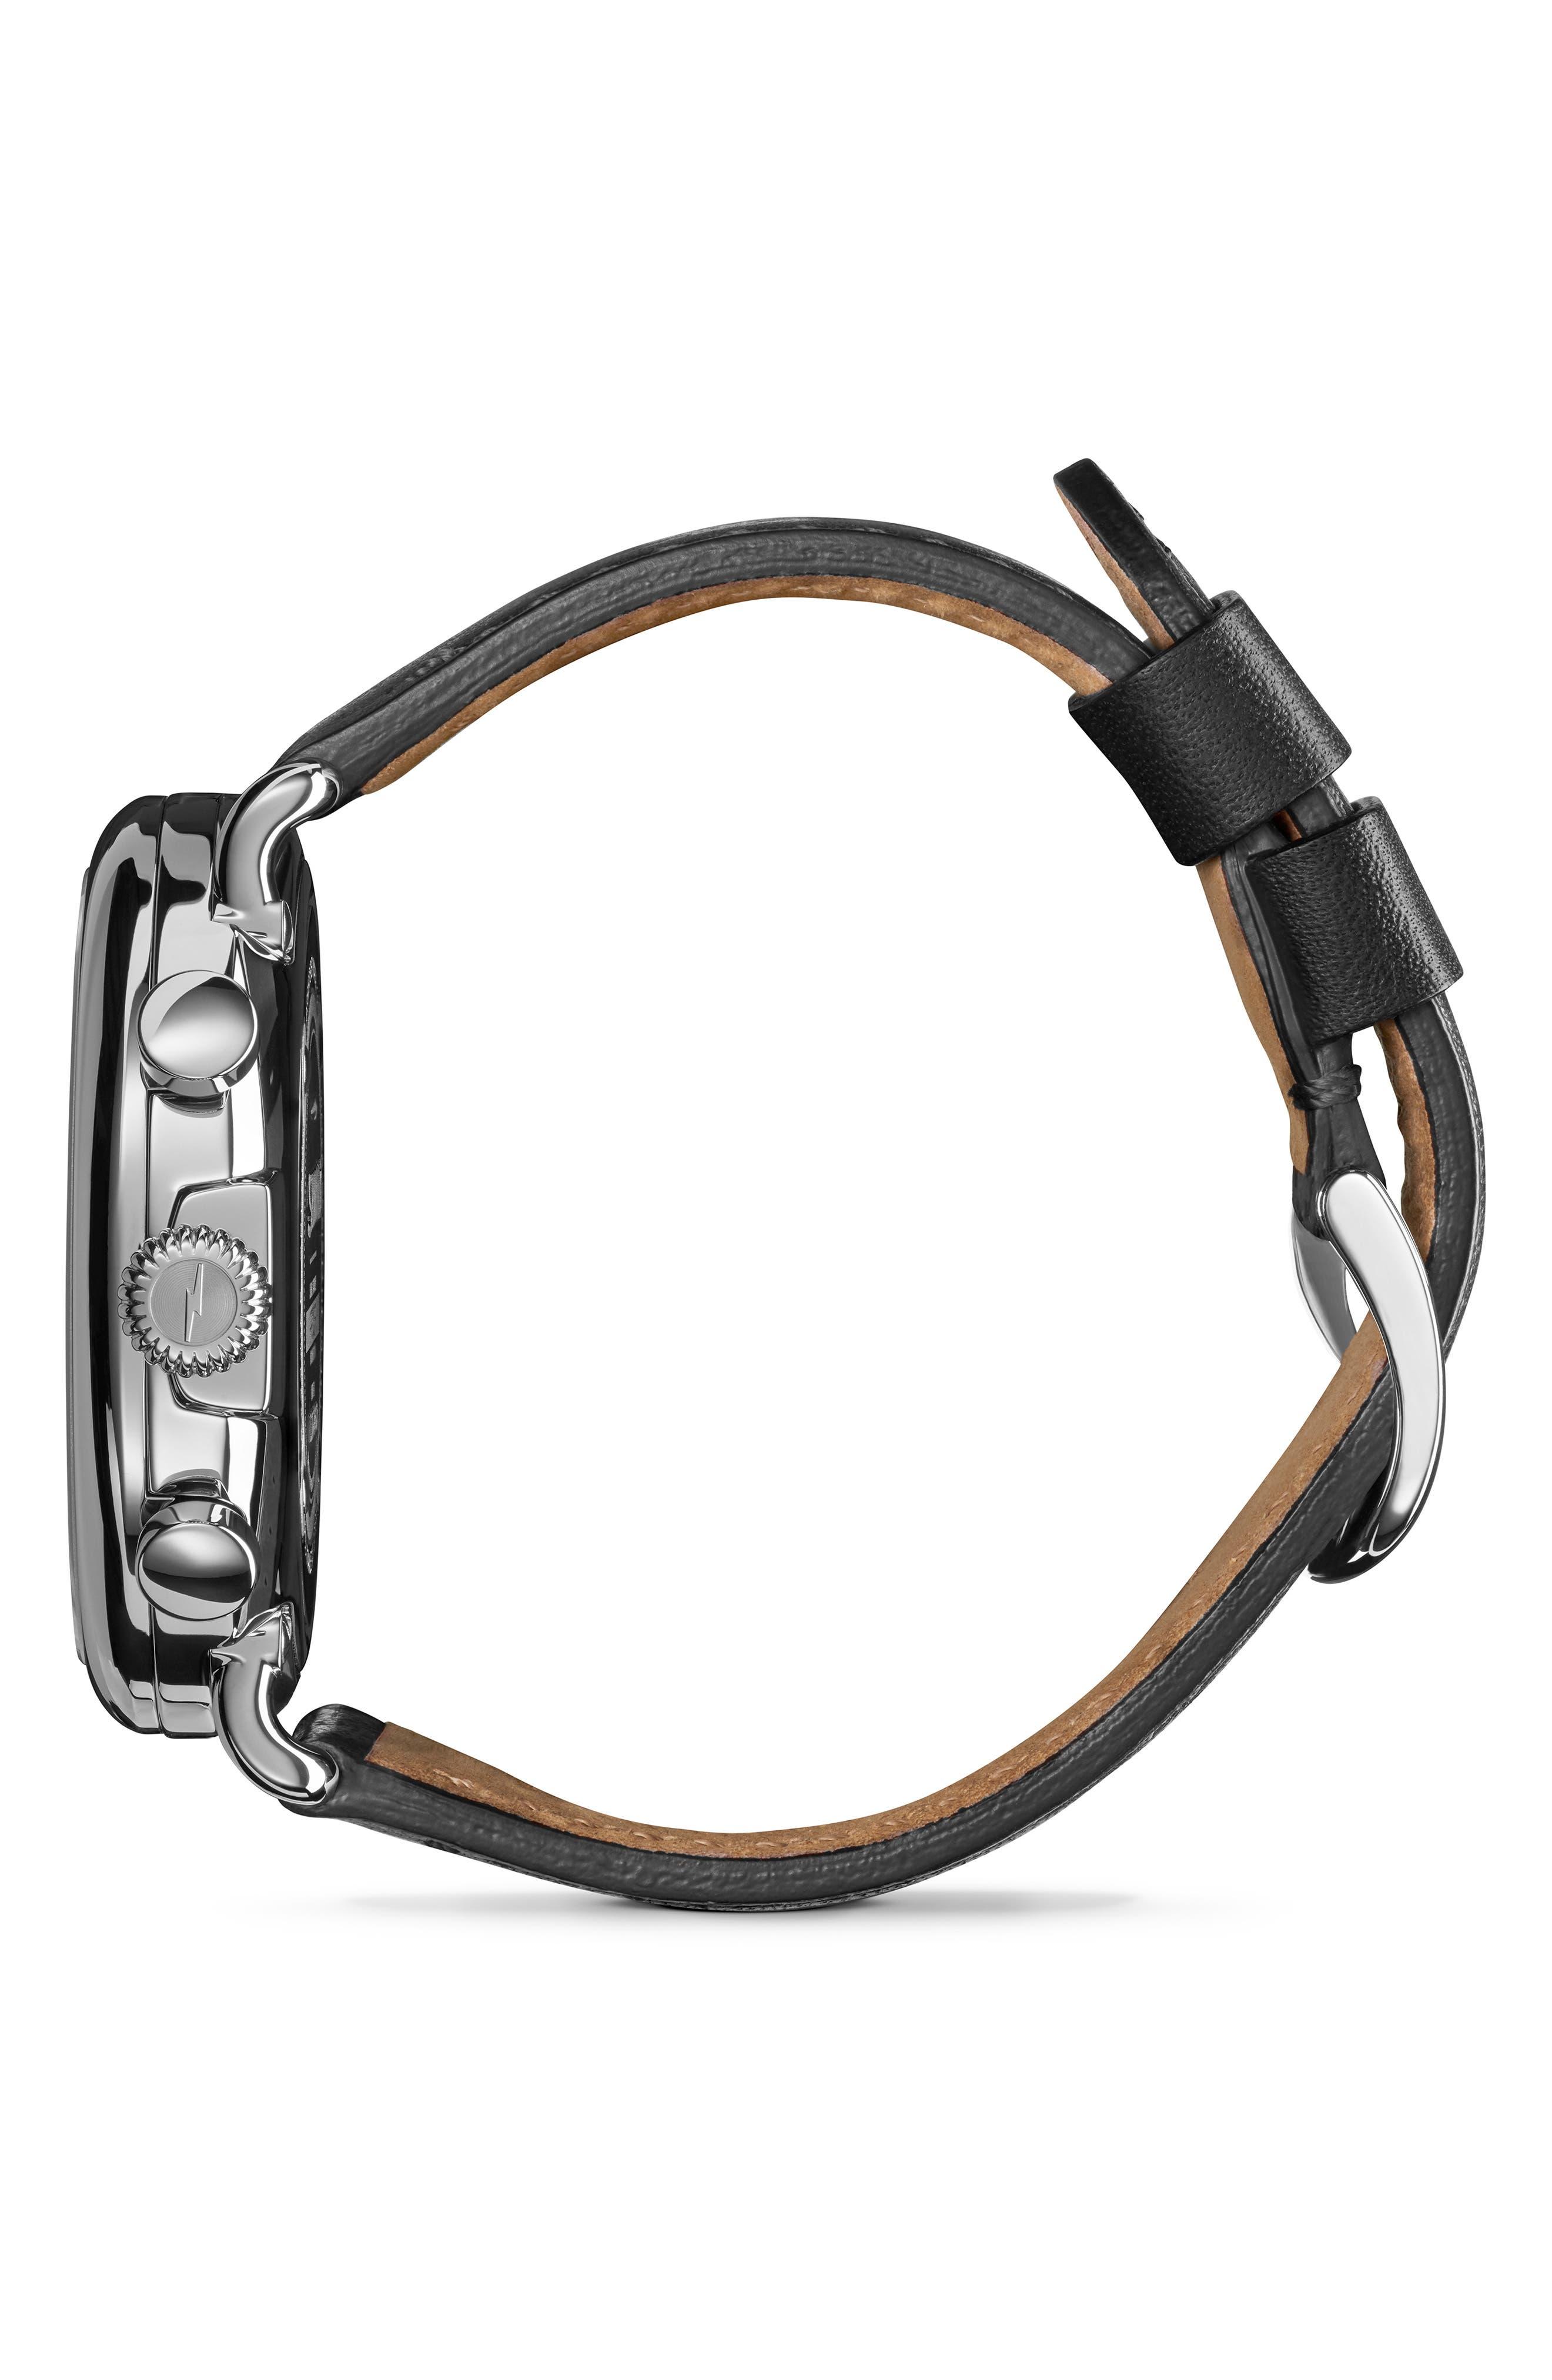 SHINOLA, The Runwell Chrono Leather Strap Watch, 47mm, Alternate thumbnail 4, color, 002